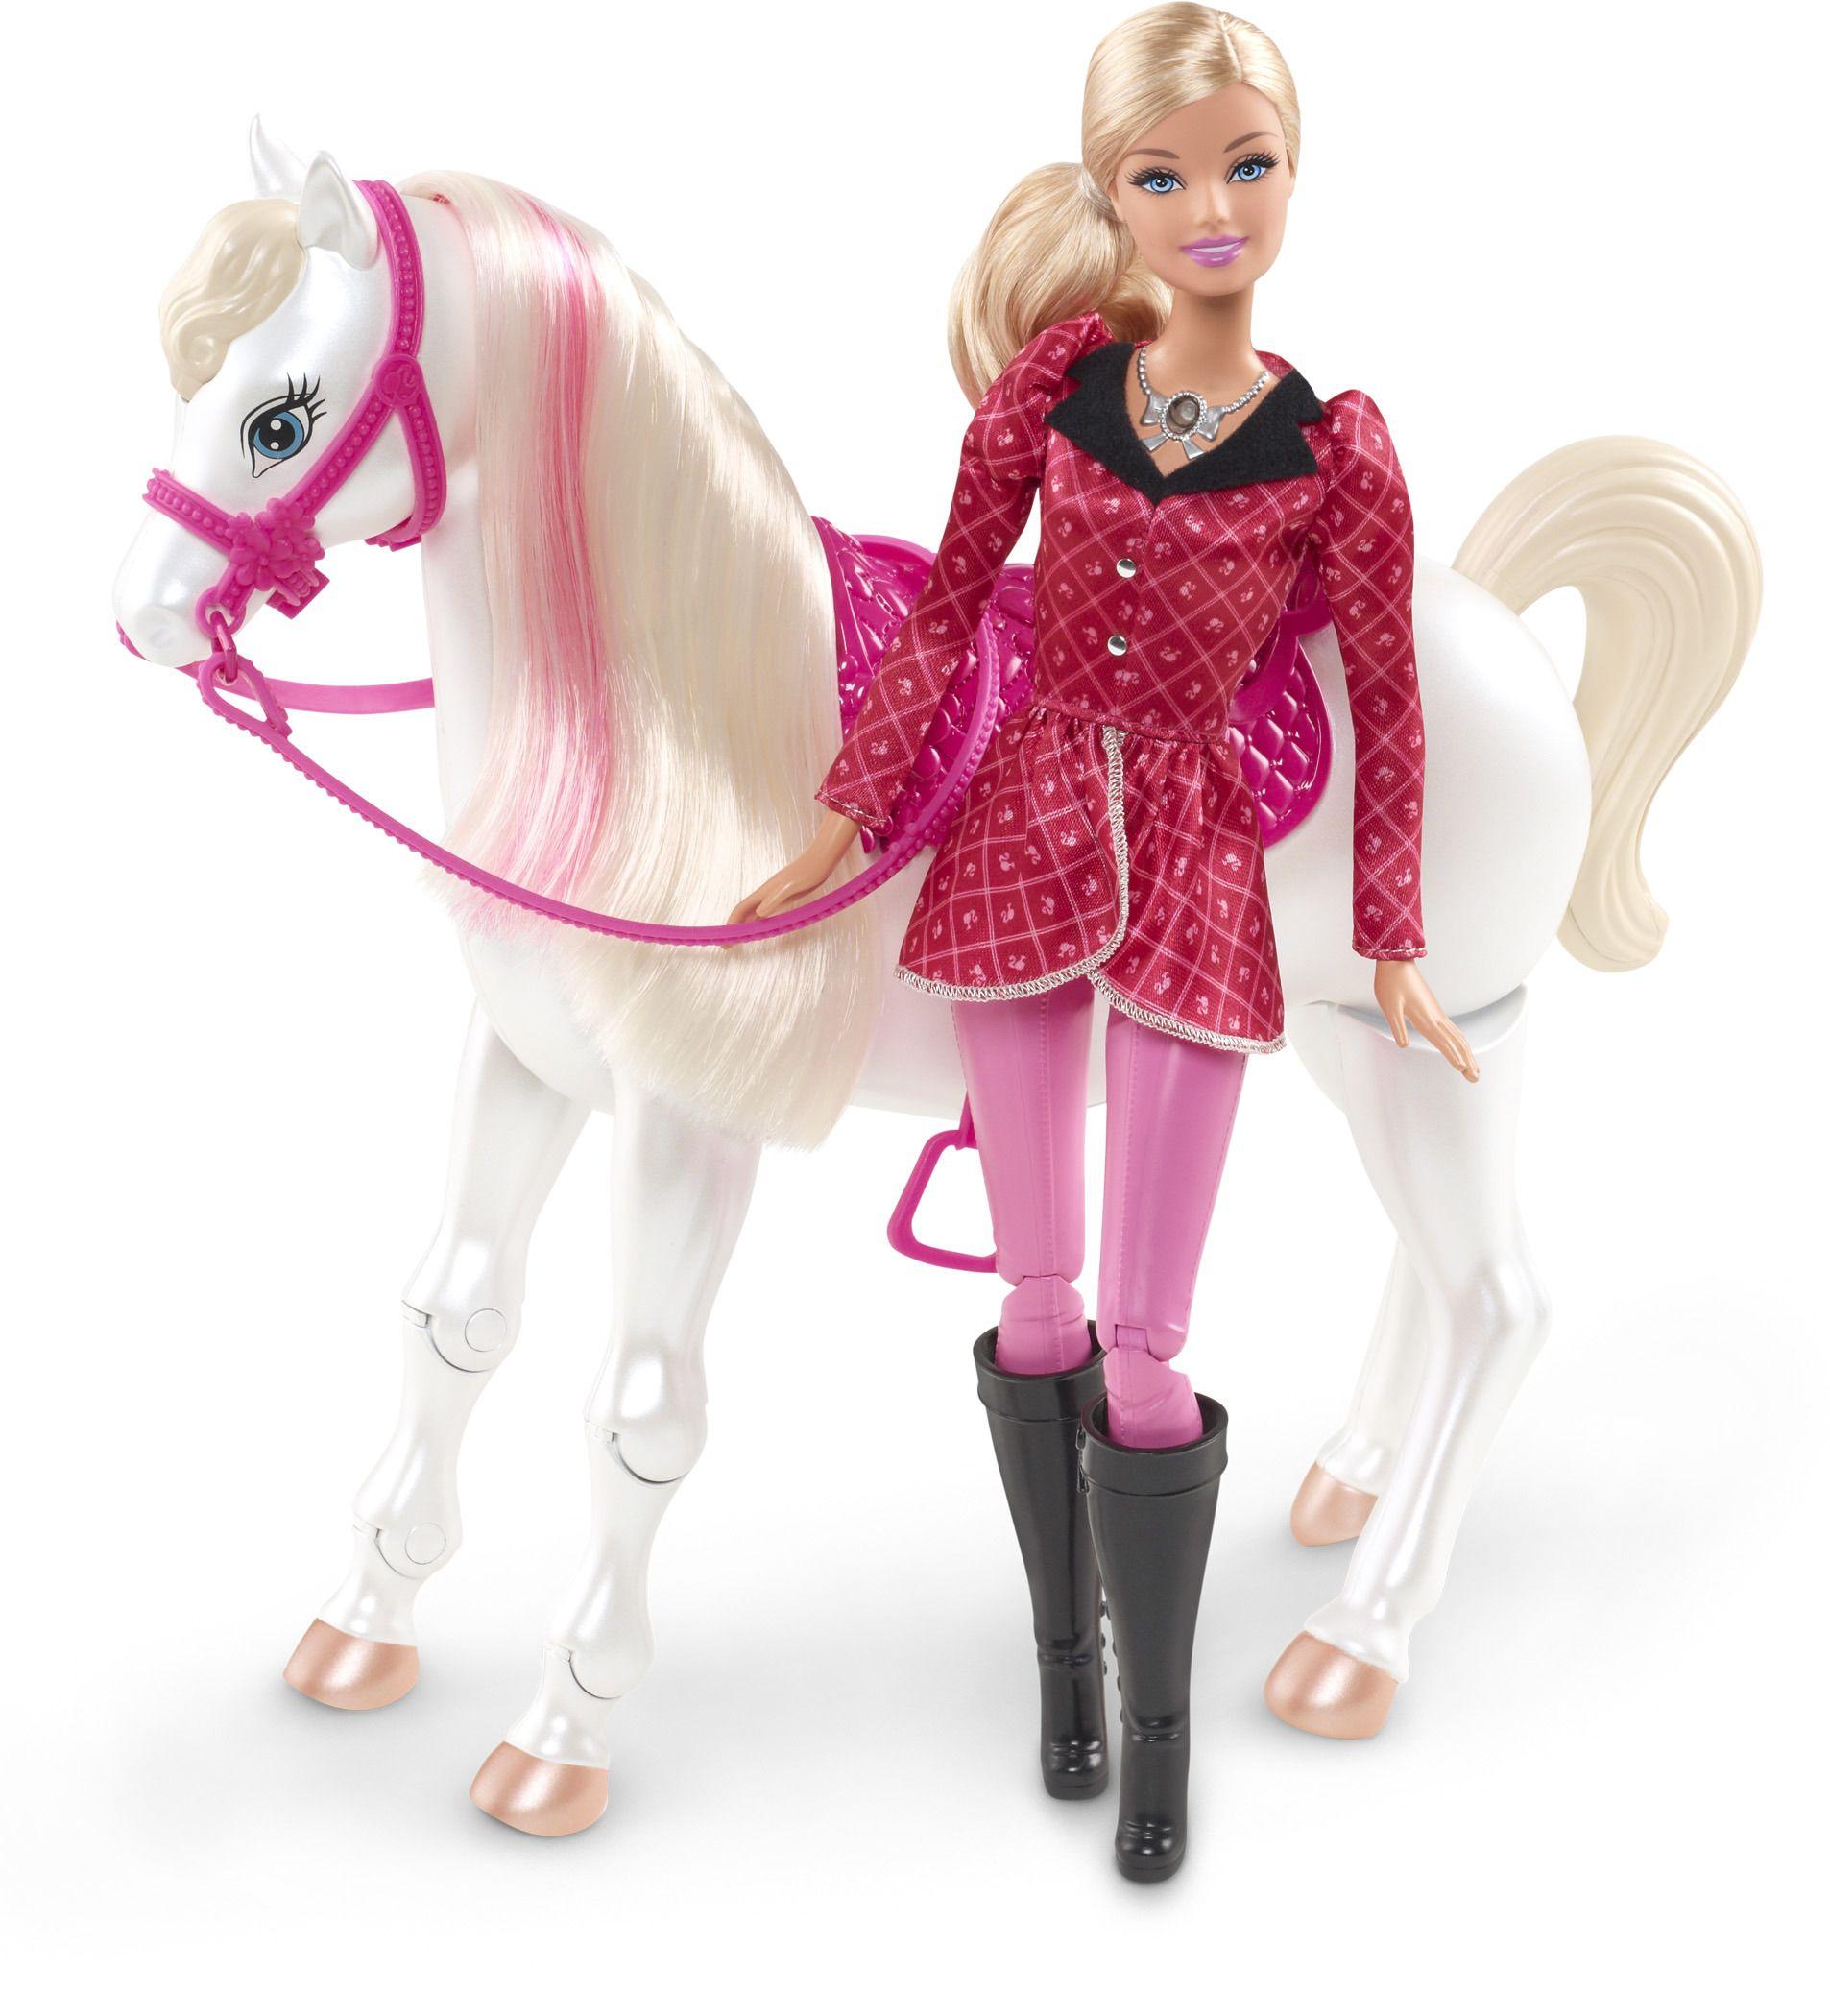 Barbie & Her Sisters in A Pony Tale/Merchandise | Pinterest | Barbie ...